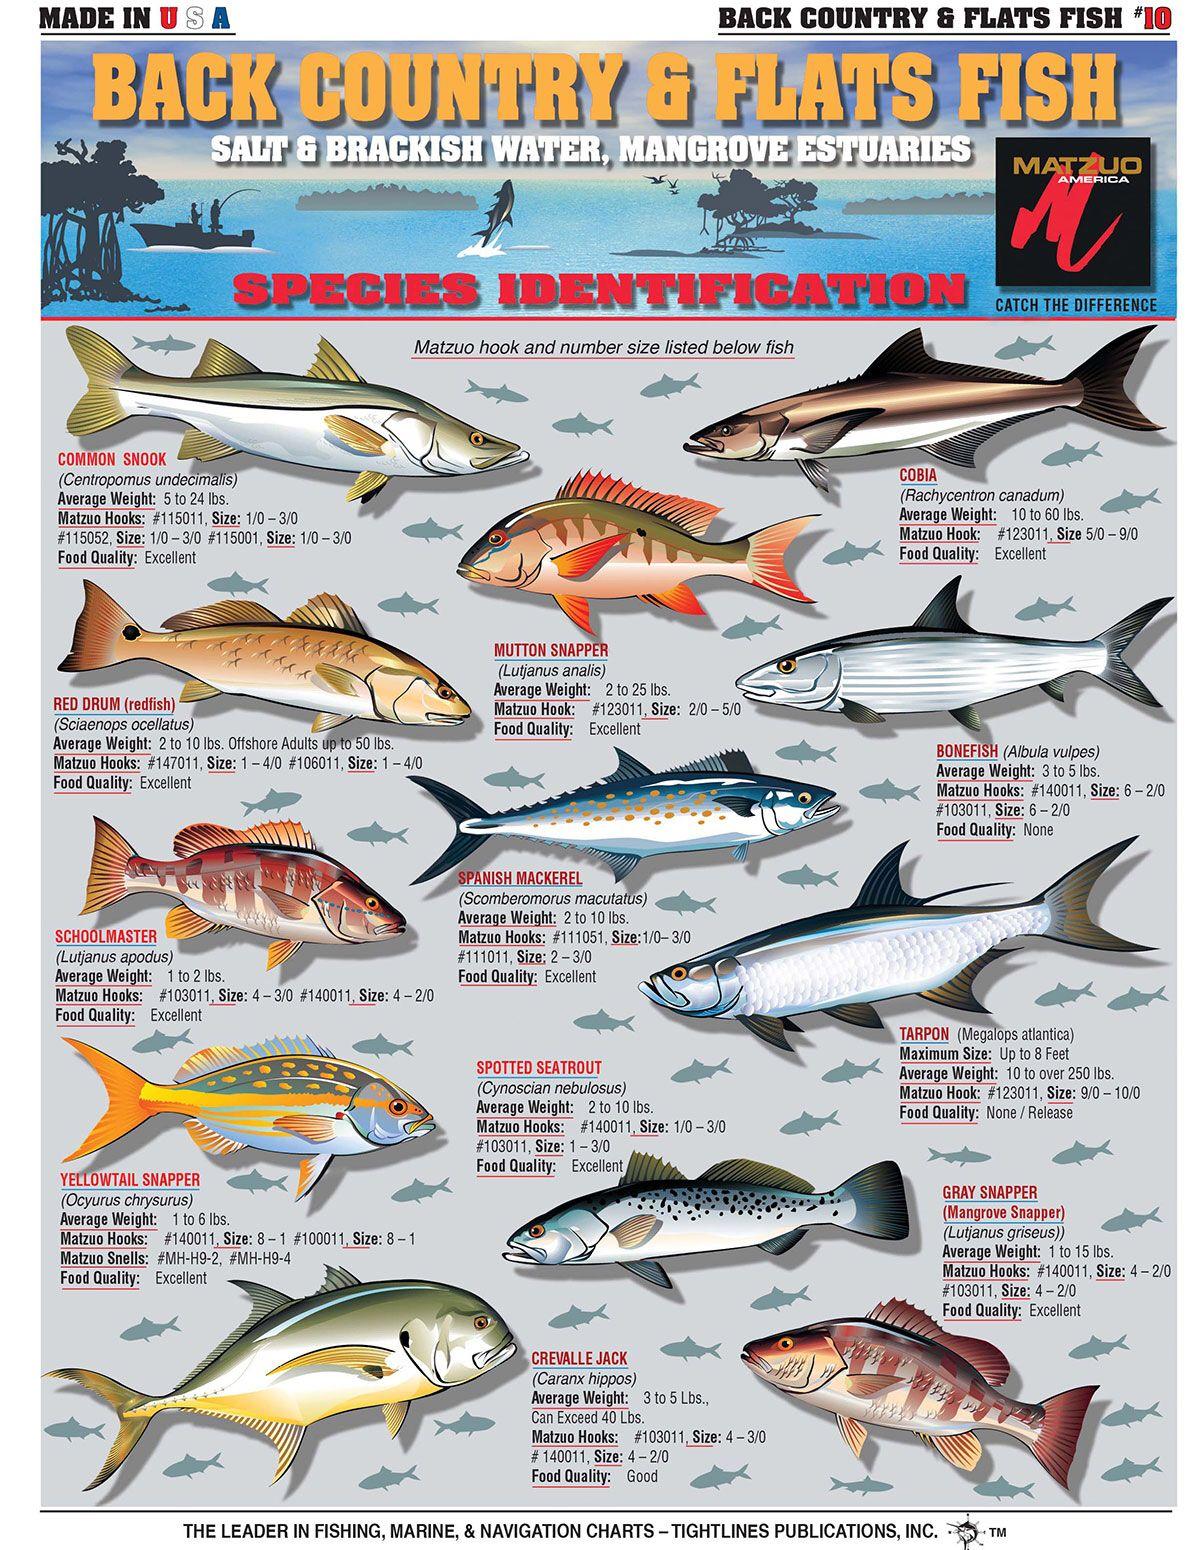 Pin By Daviper On Fishn Riggs Charts Lures Big Game Fishing Fish Chart Fish